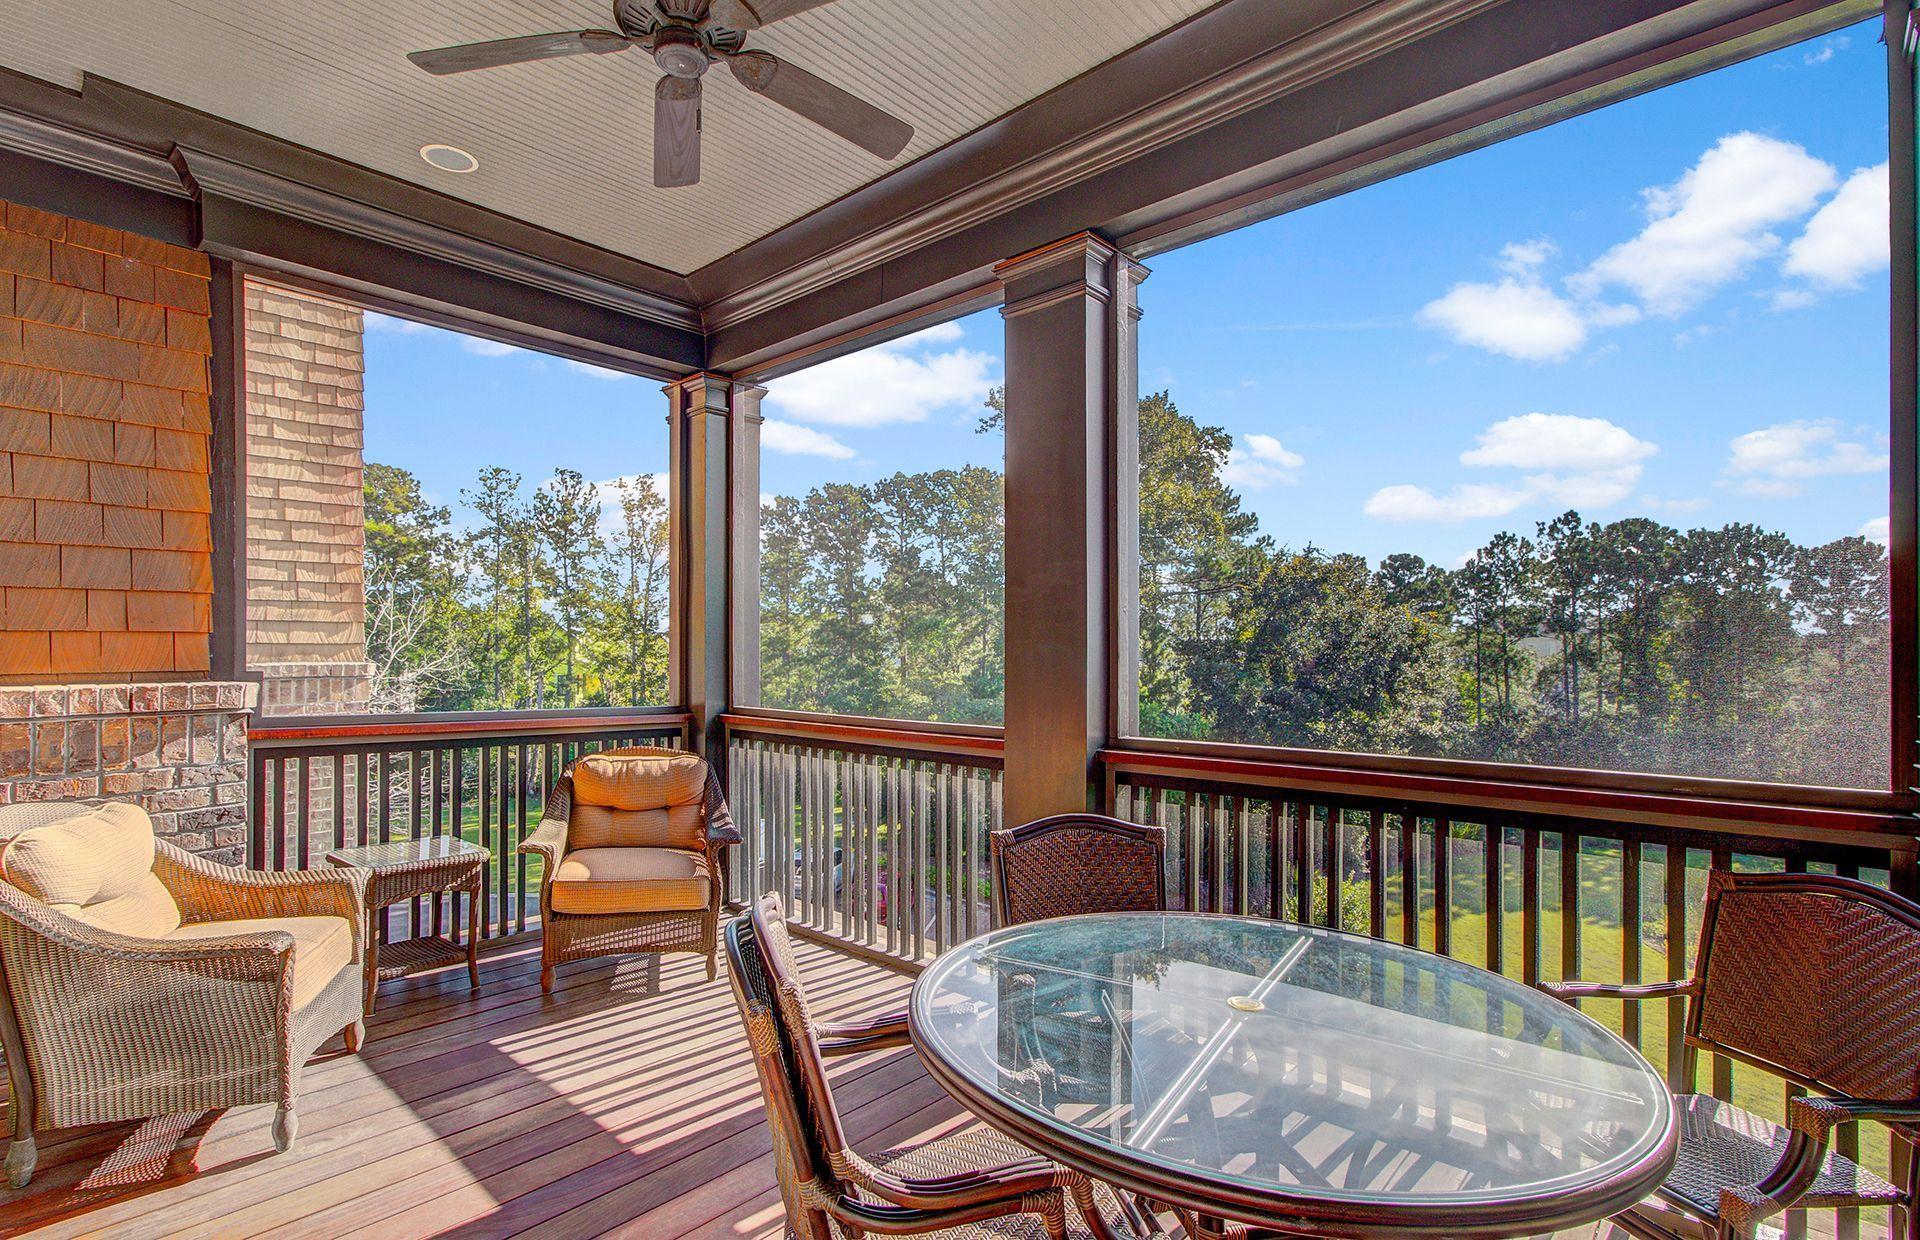 Daniel Island Park Homes For Sale - 250 Island Park, Charleston, SC - 34